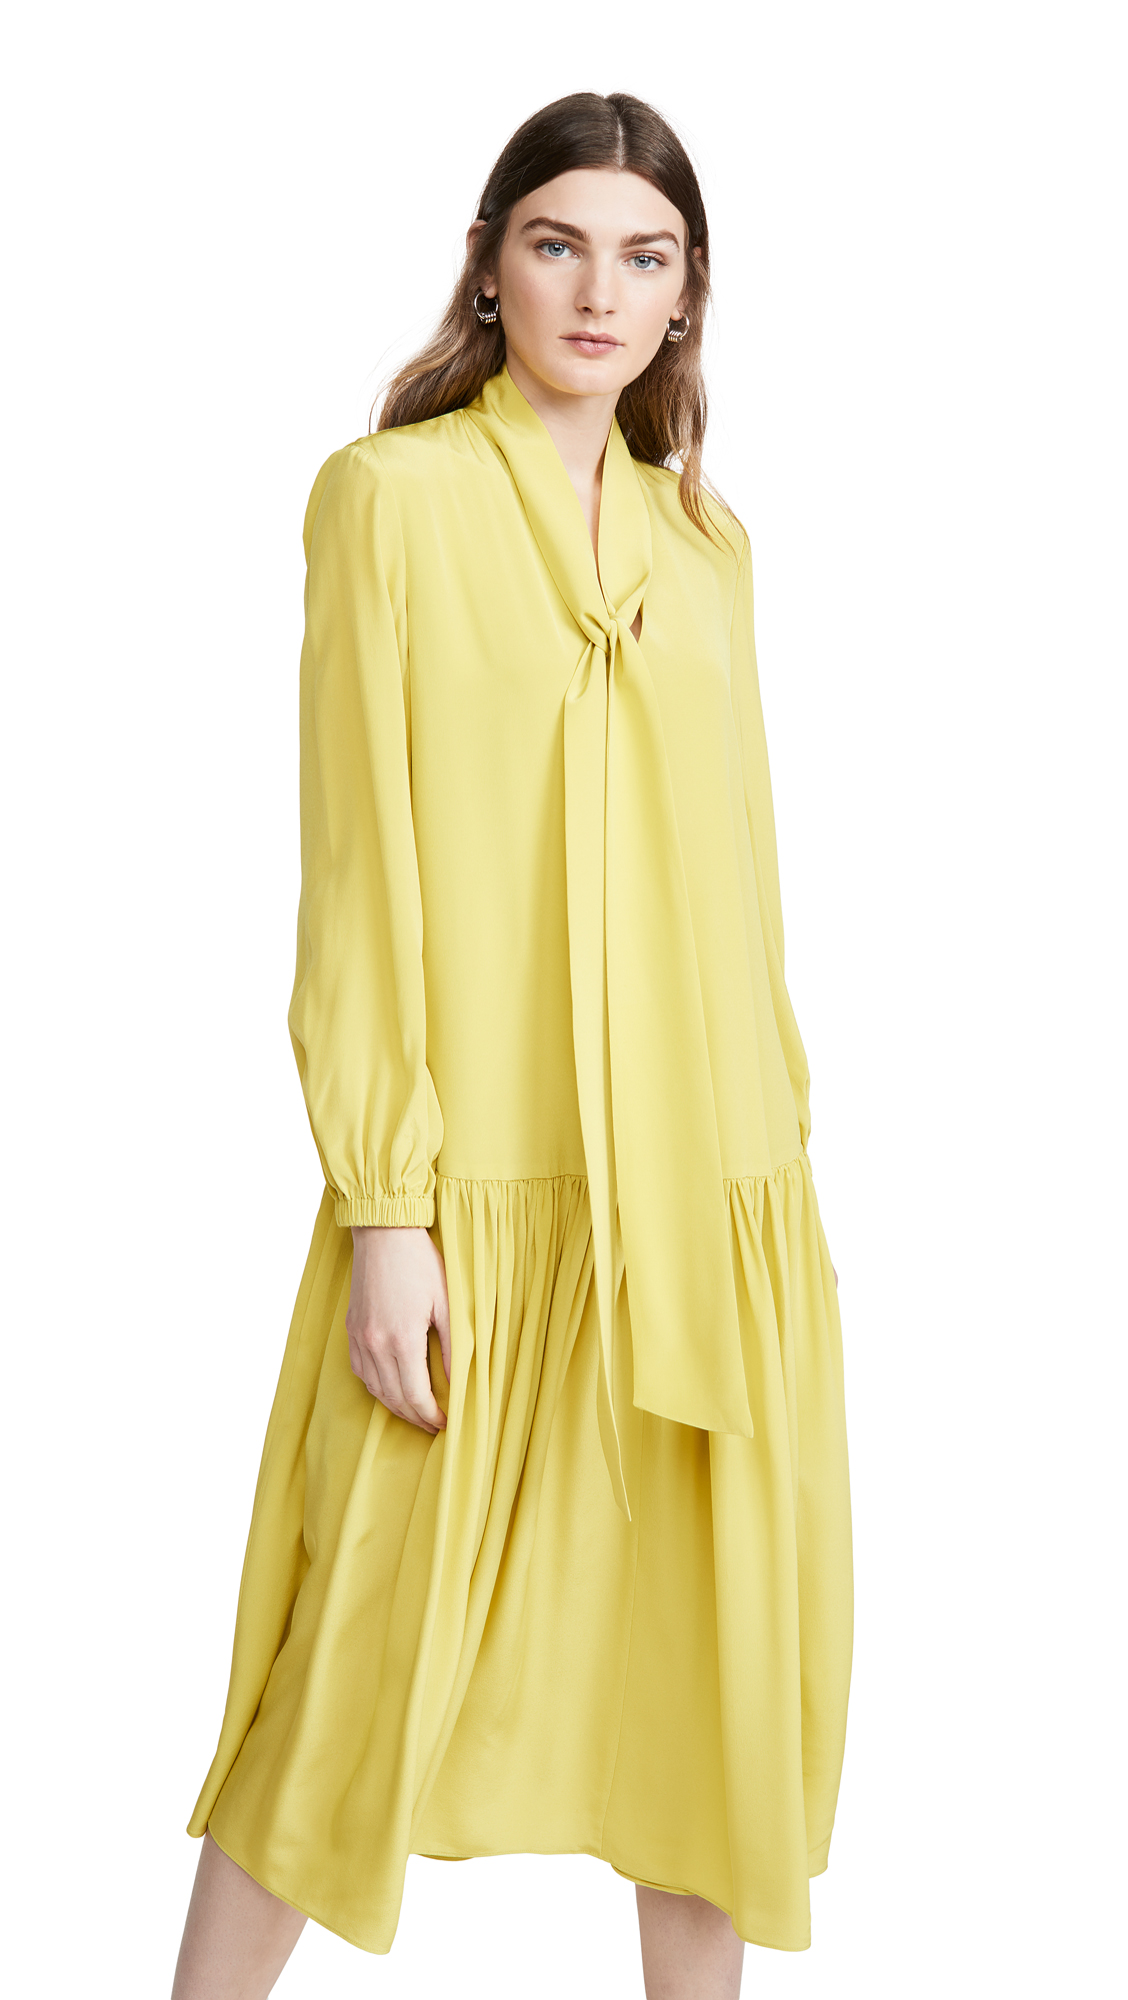 Tibi Drop Waist Dress – 40% Off Sale